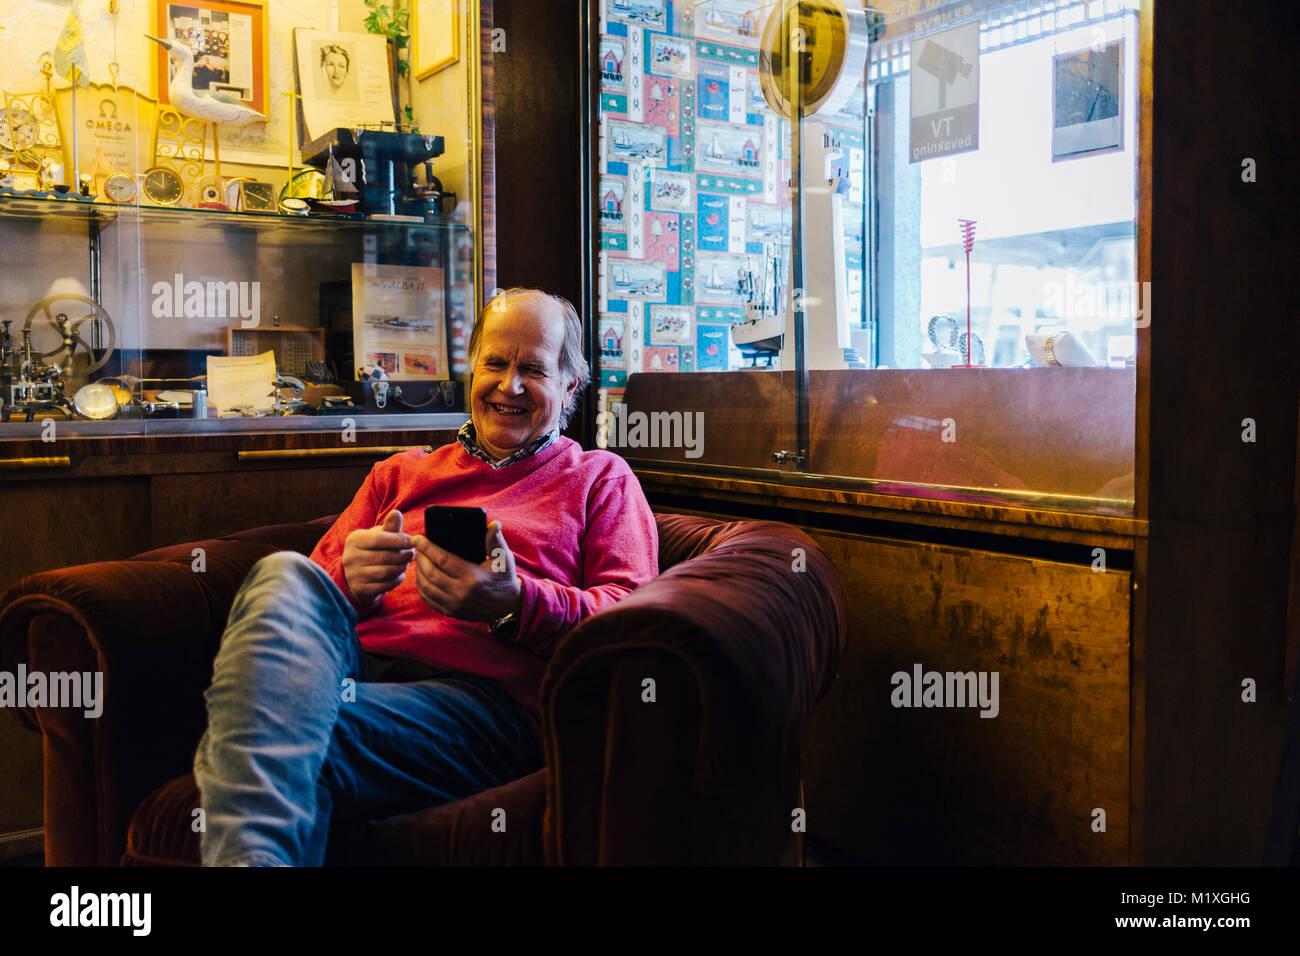 Hombre en un sillón con smart phone en Suecia Imagen De Stock